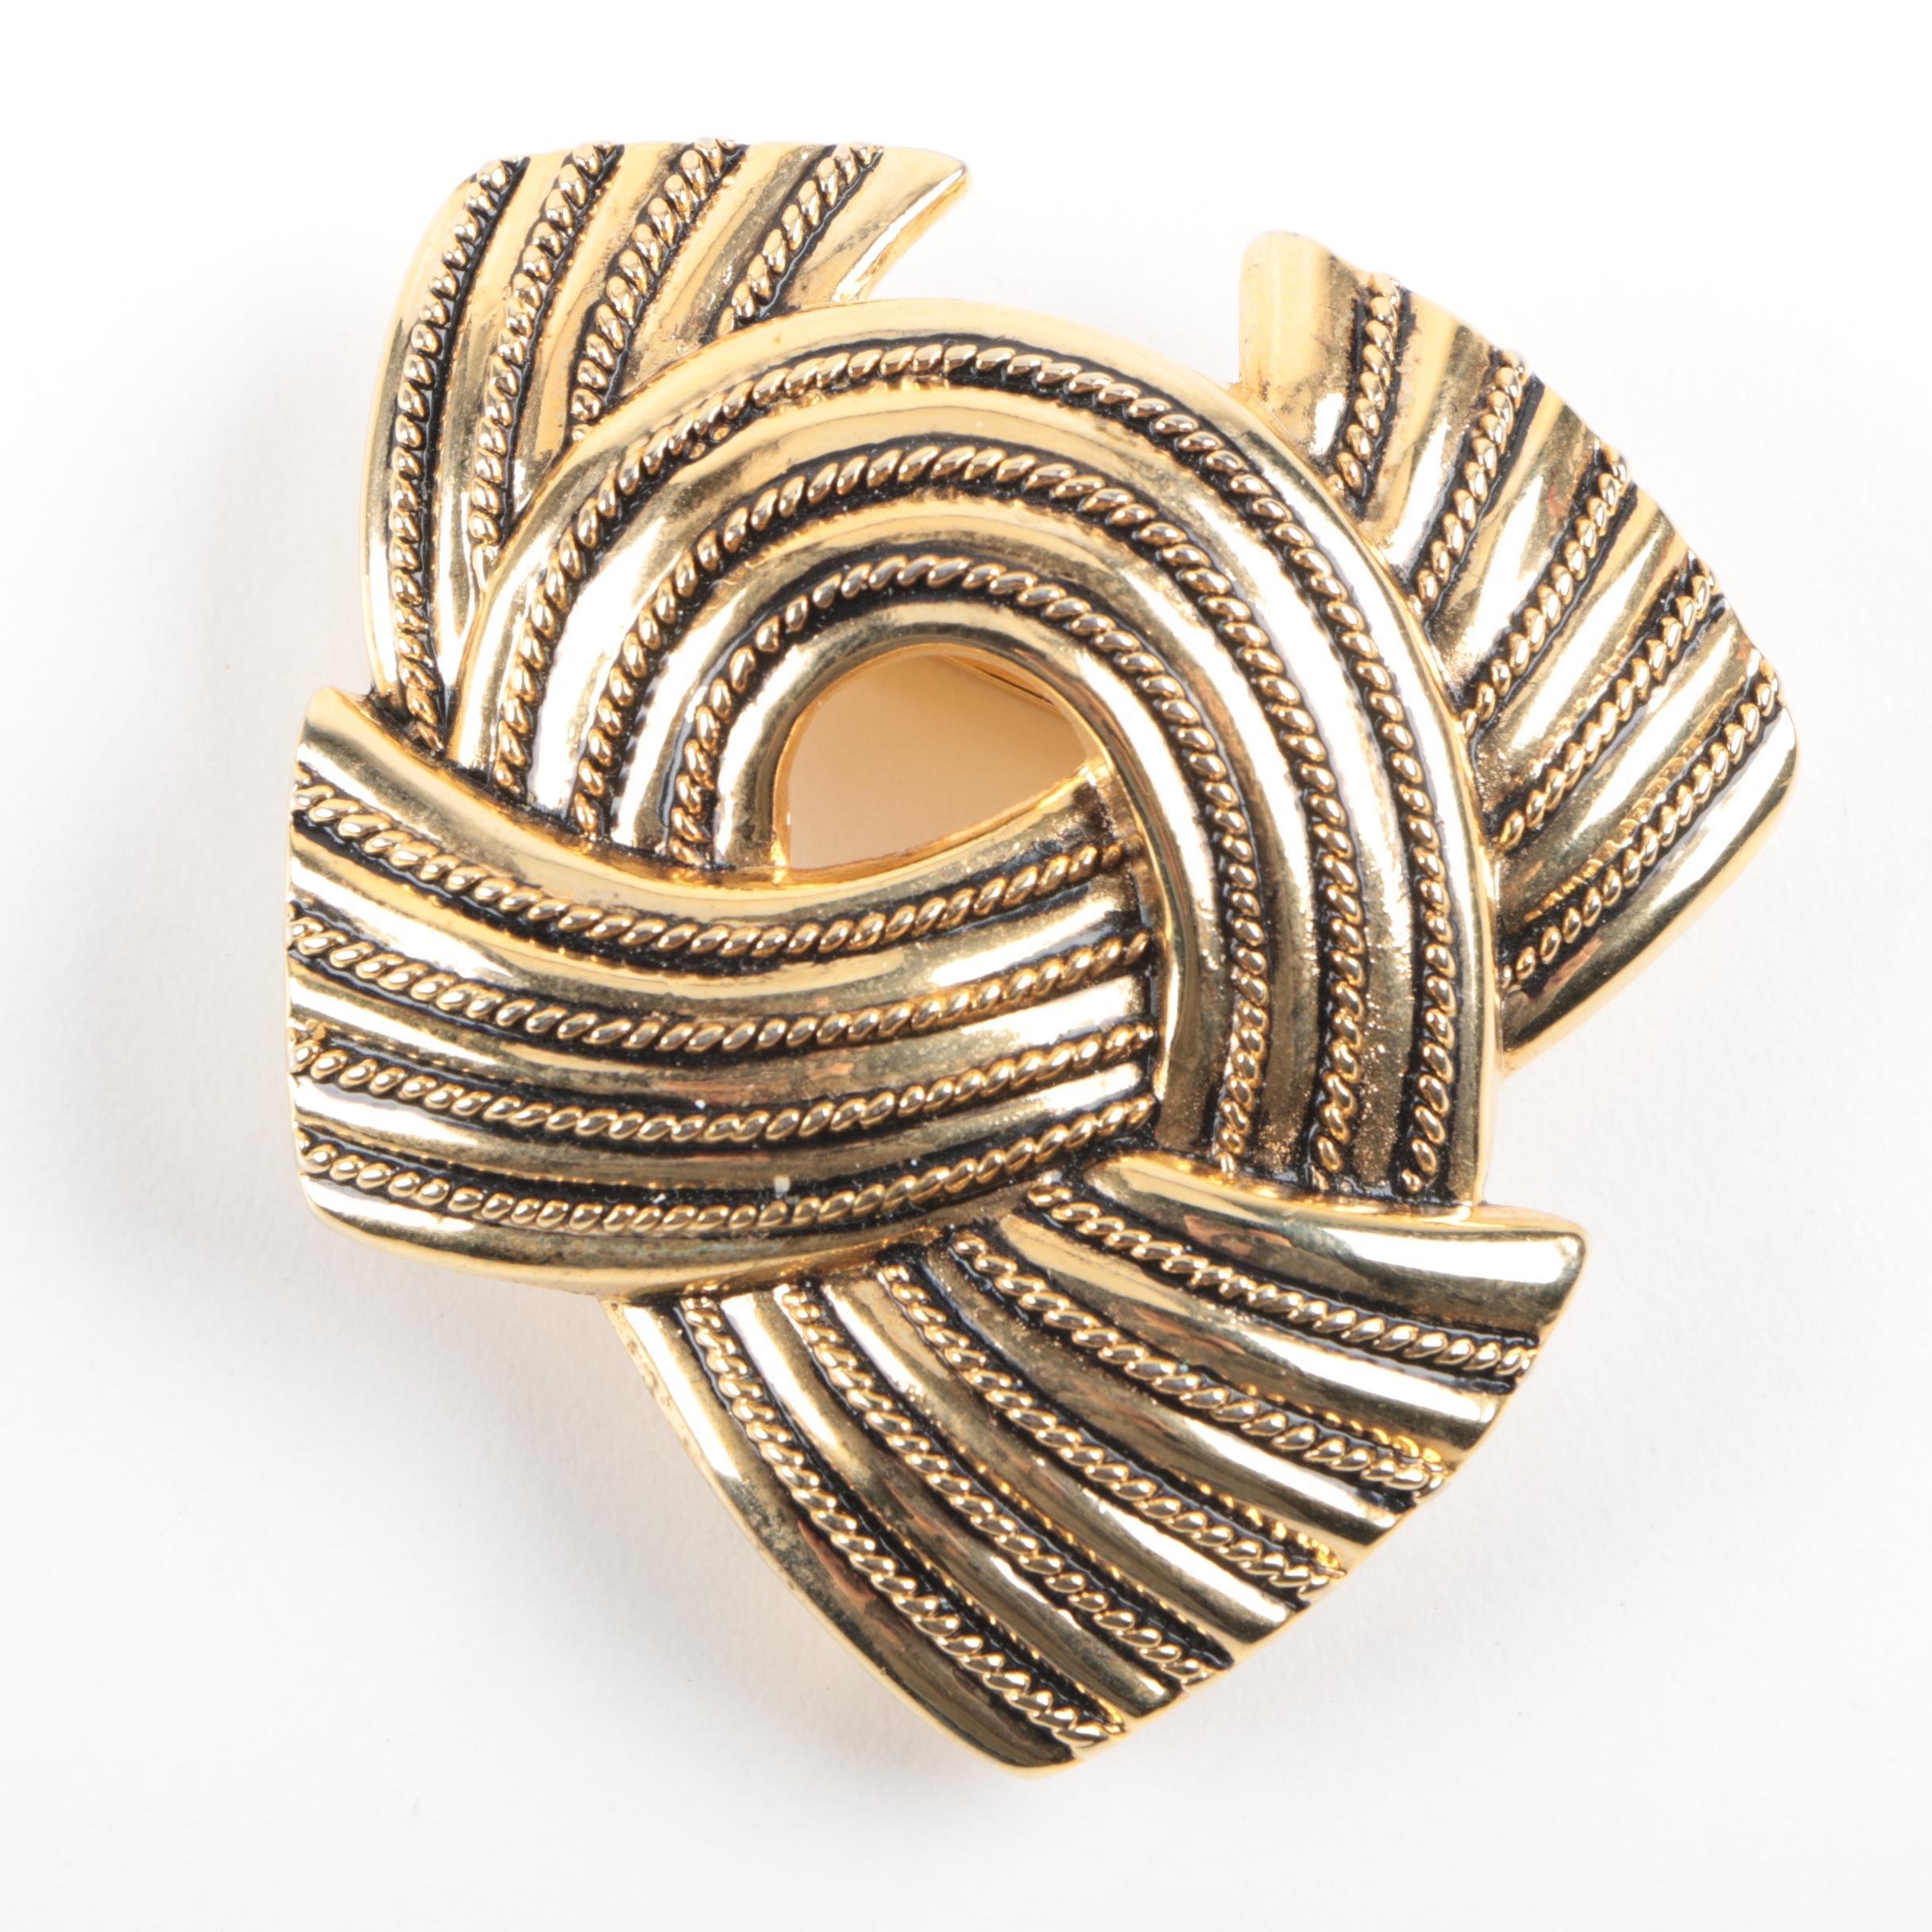 Gold Toned Metal Belt Buckle